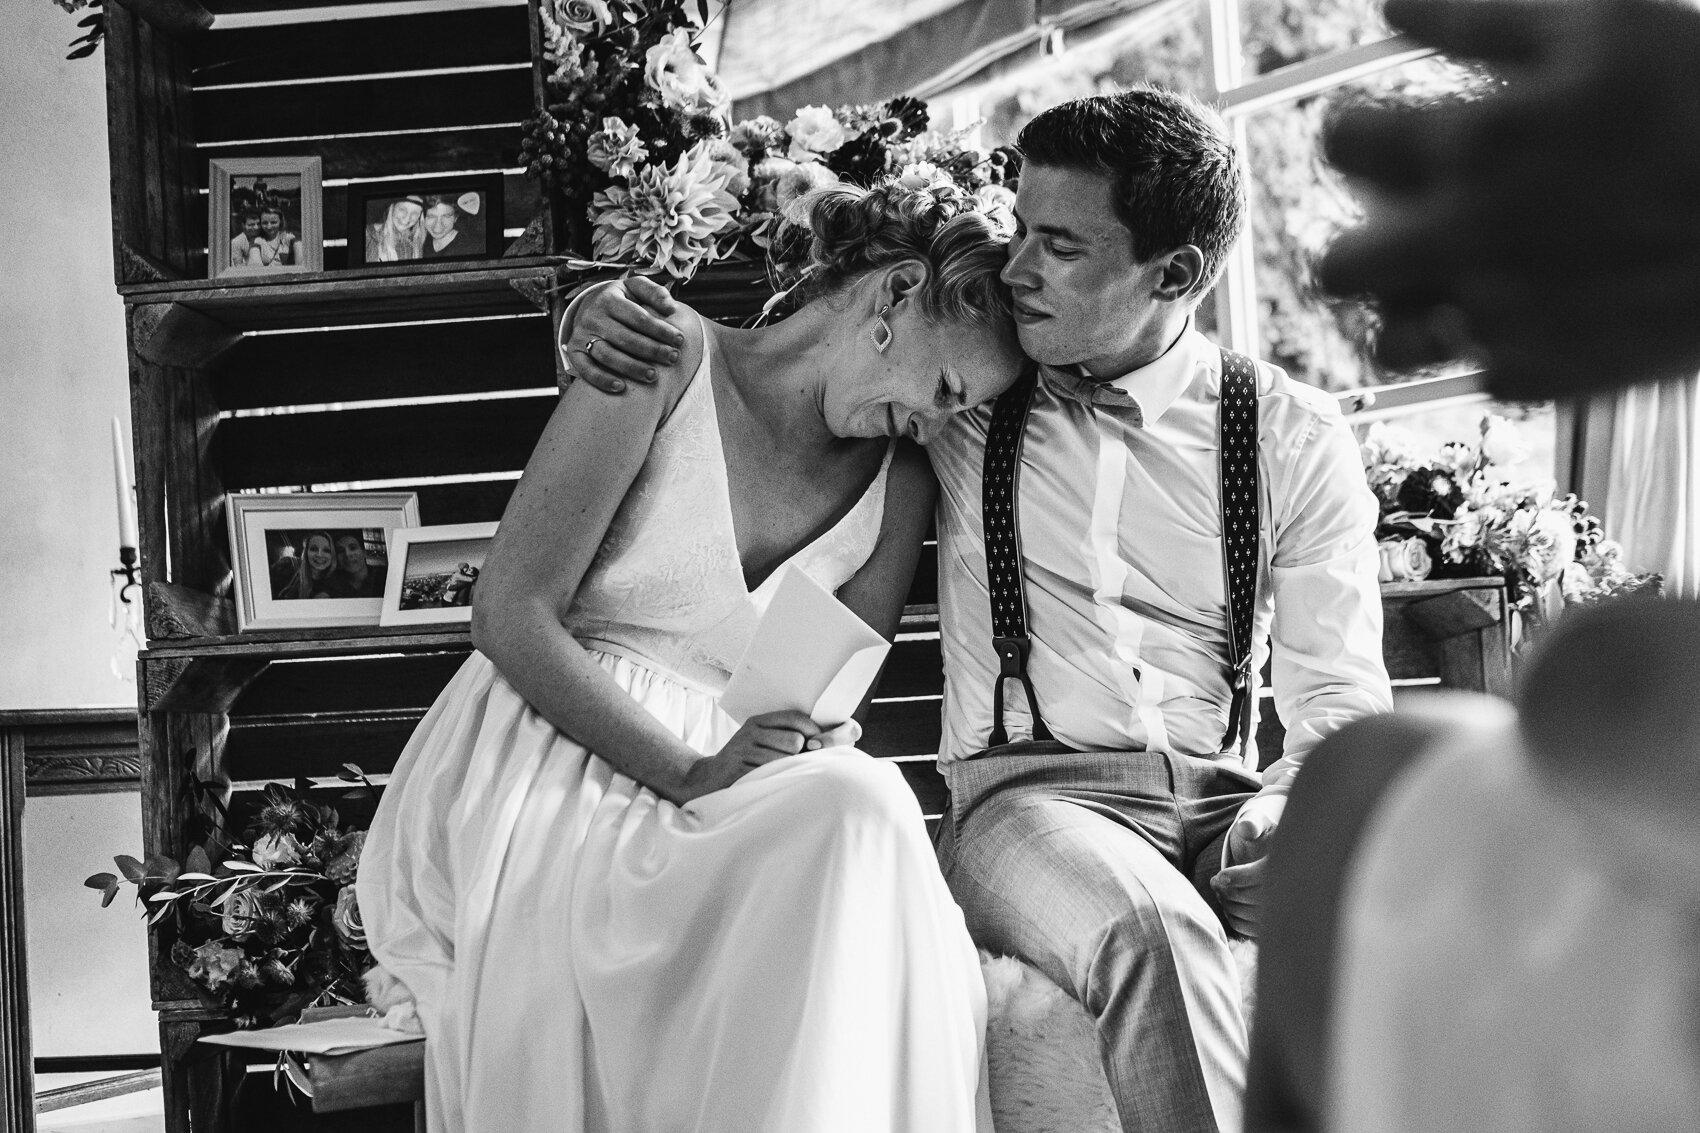 iso800 - huwelijksfotograaf isabo matthias verbeke foundation-27.jpg